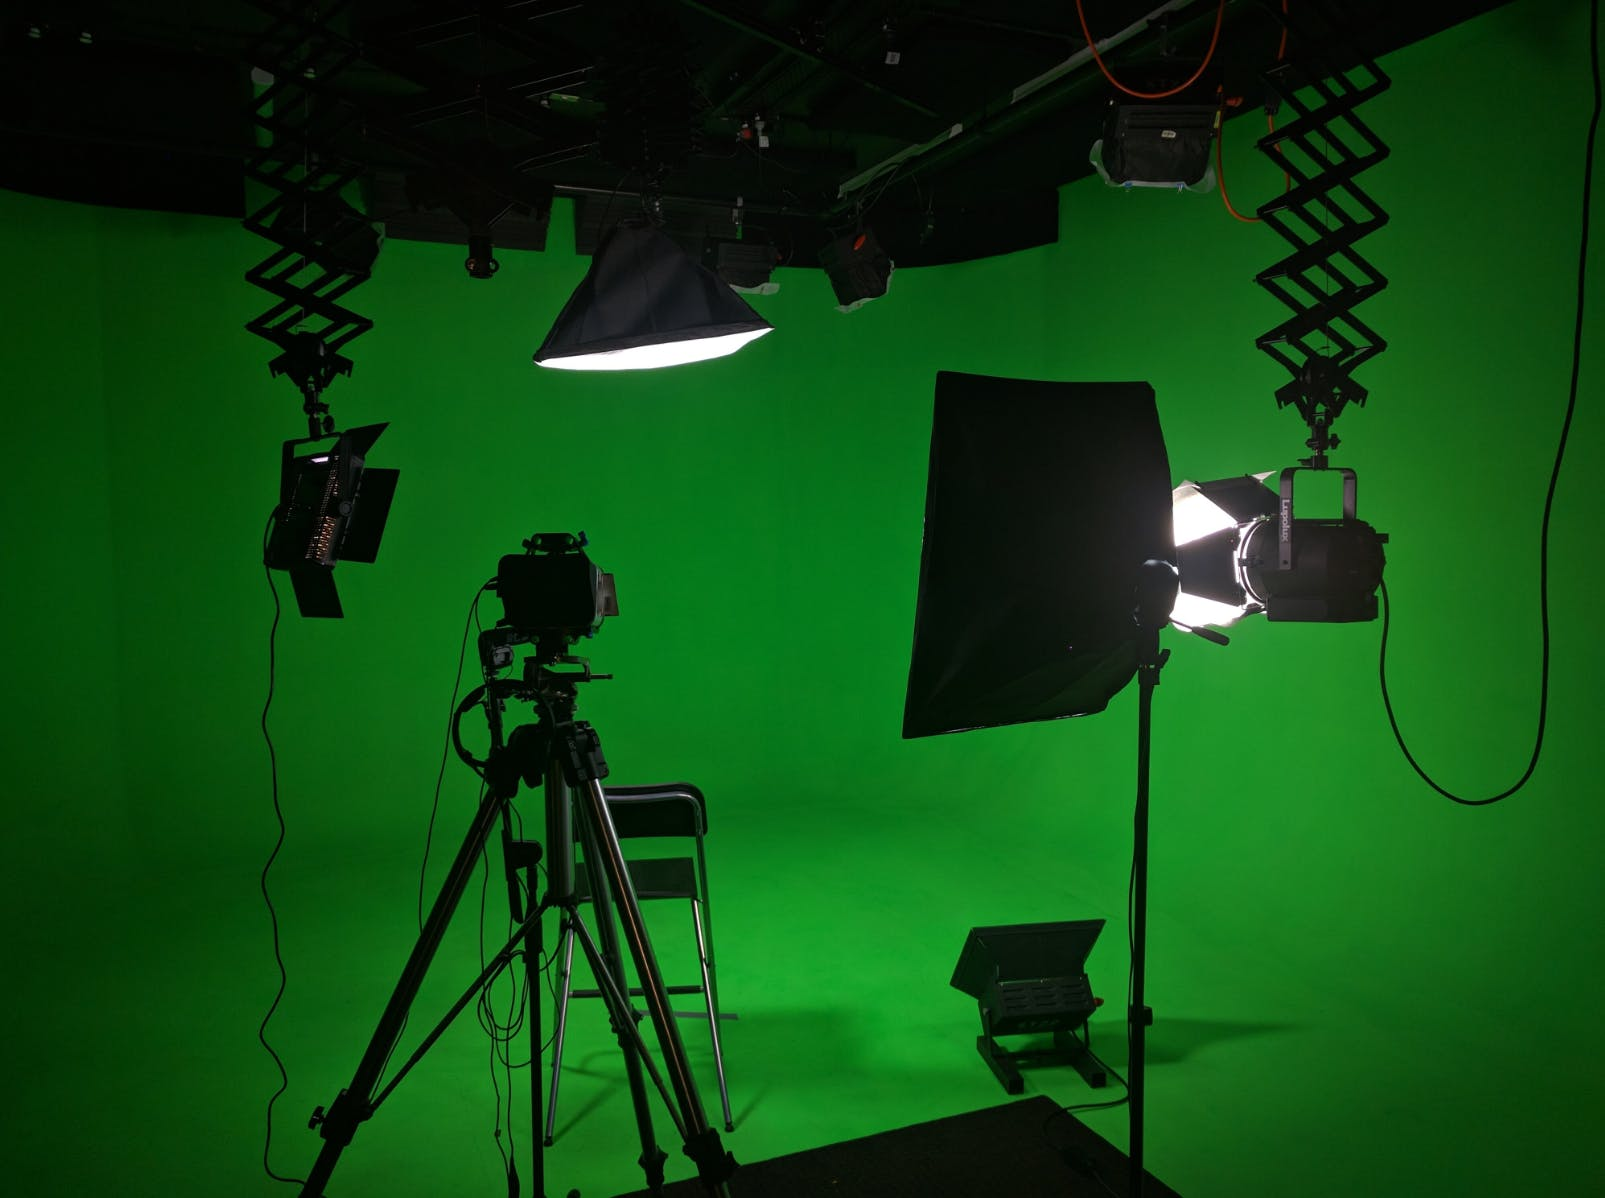 Green Screen, creative studio at Basem3nt Enterprises, image 1